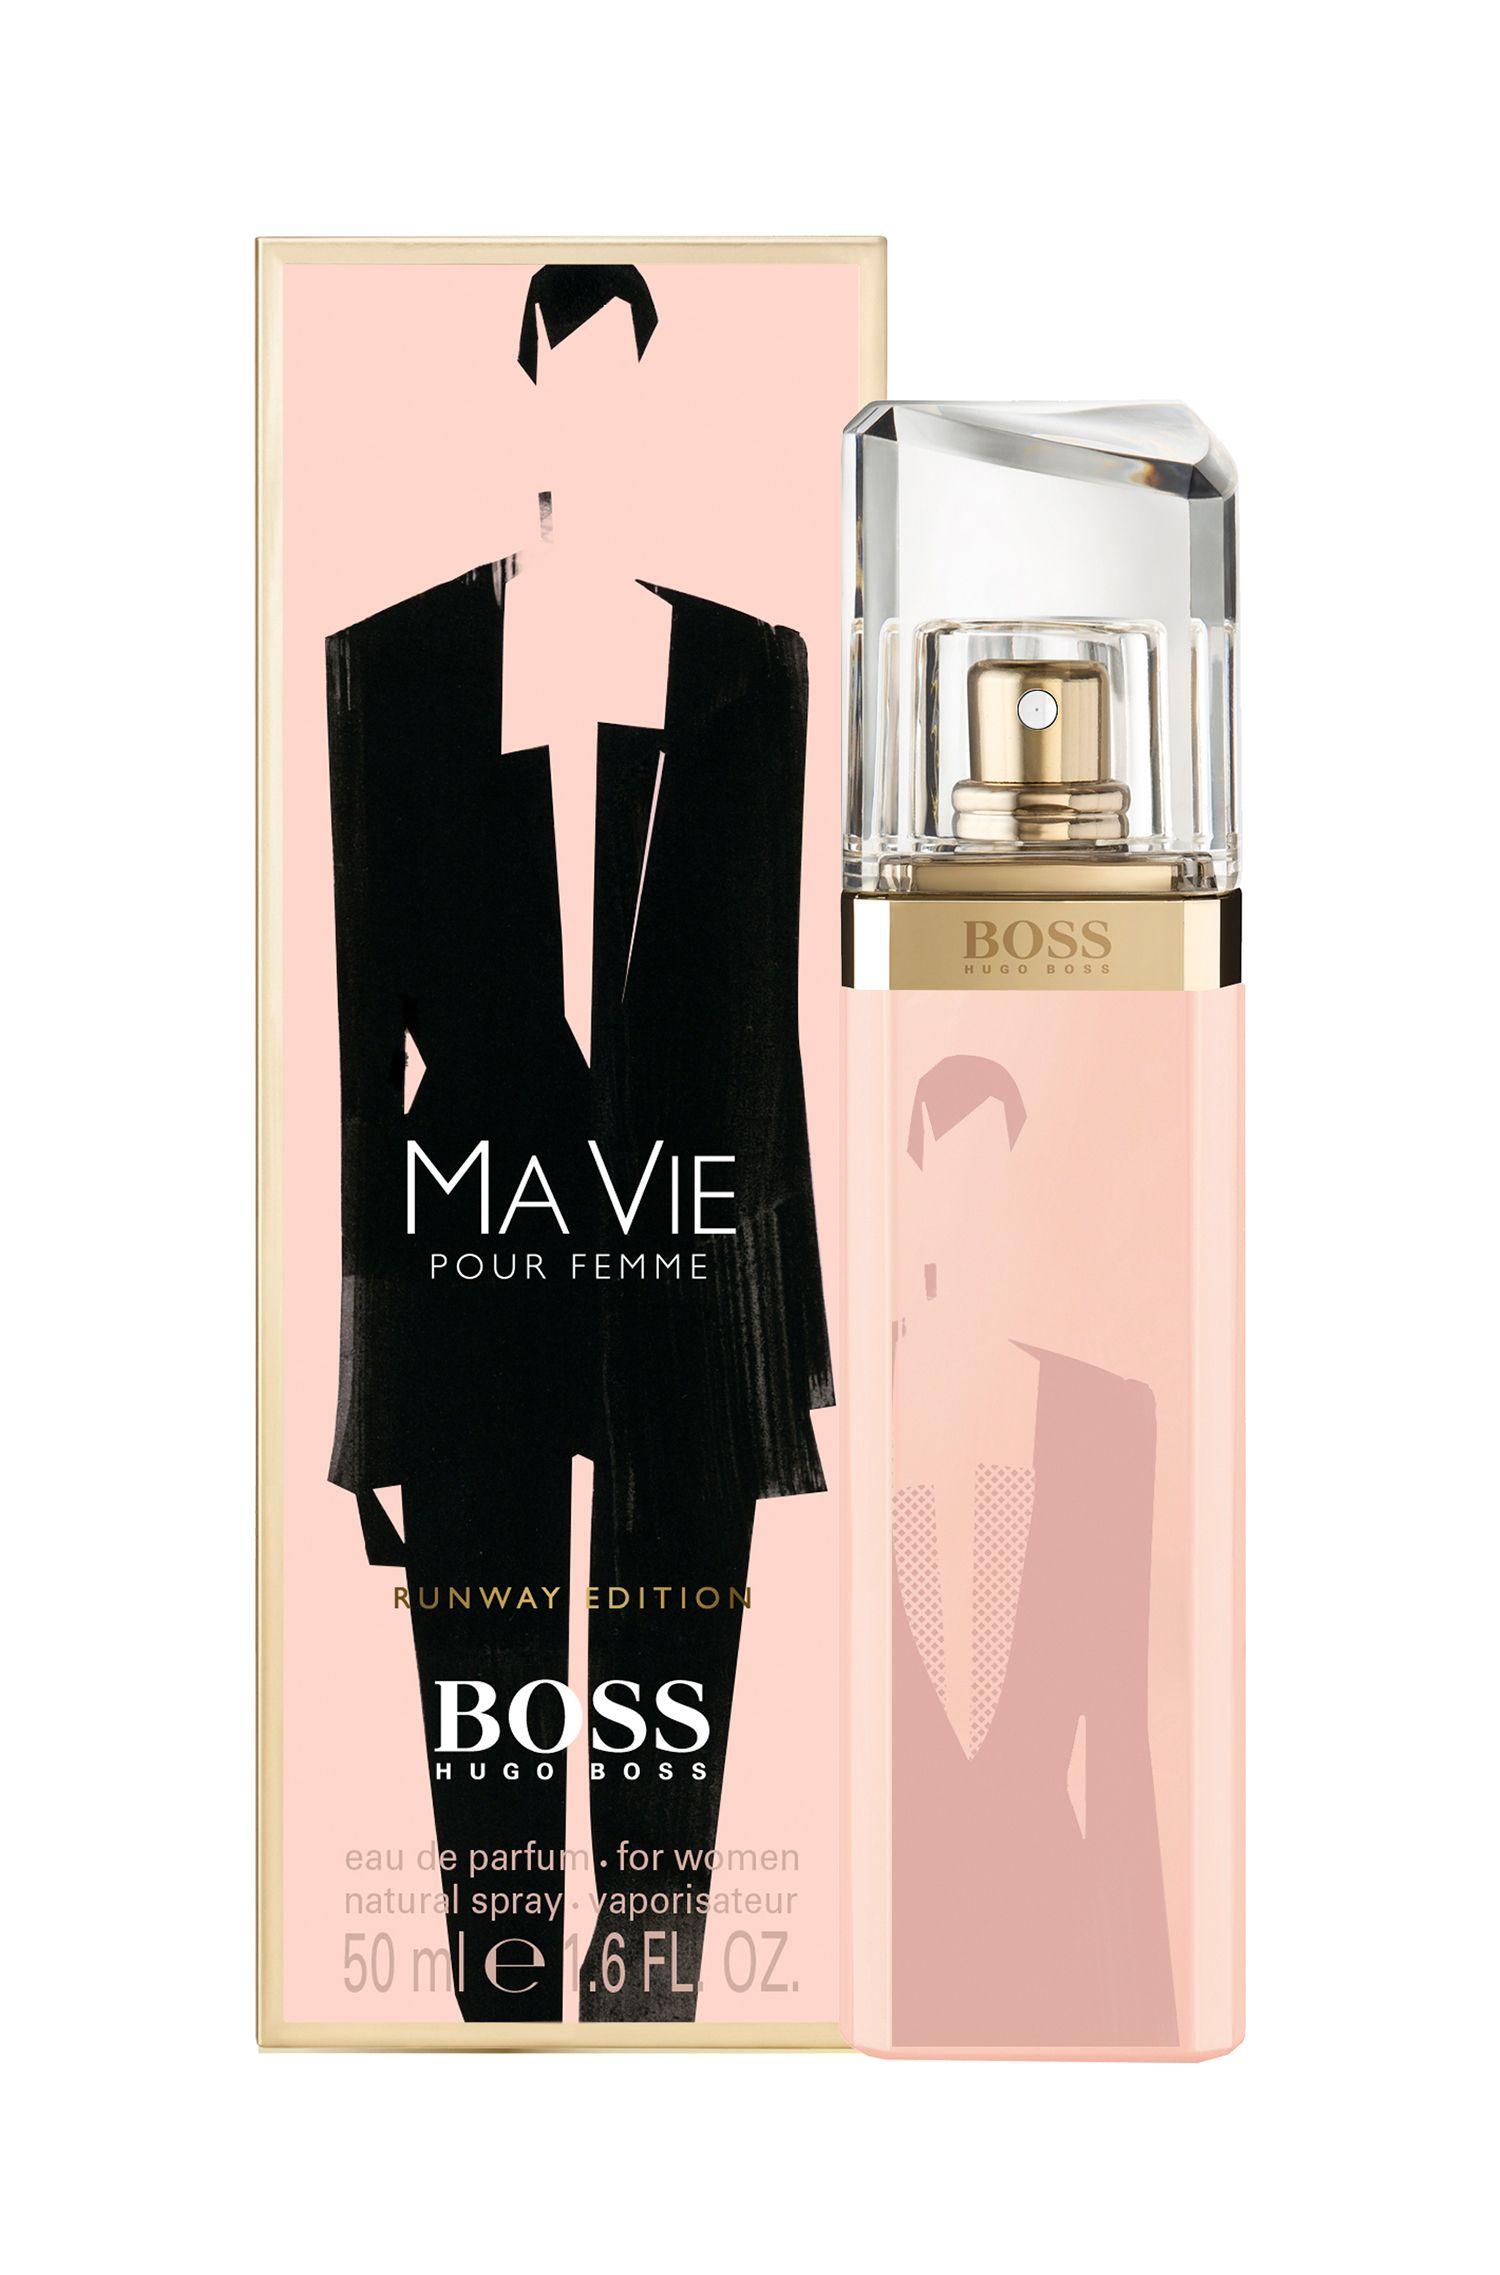 Boss Ma Vie Pour Femme Runway Edition Hugo Boss perfume ...